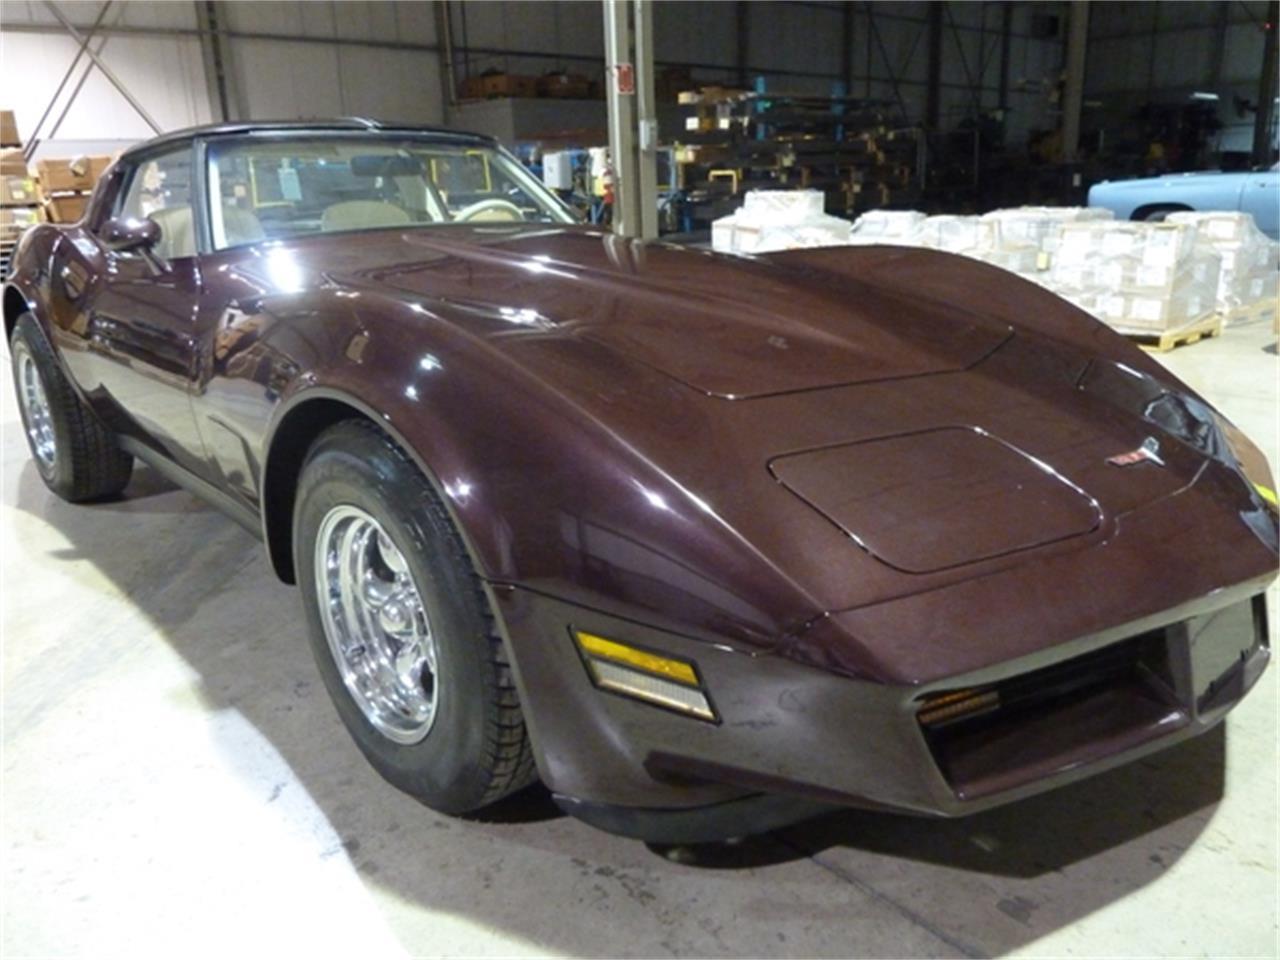 Large Picture of '80 Corvette - $19,900.00 - J312